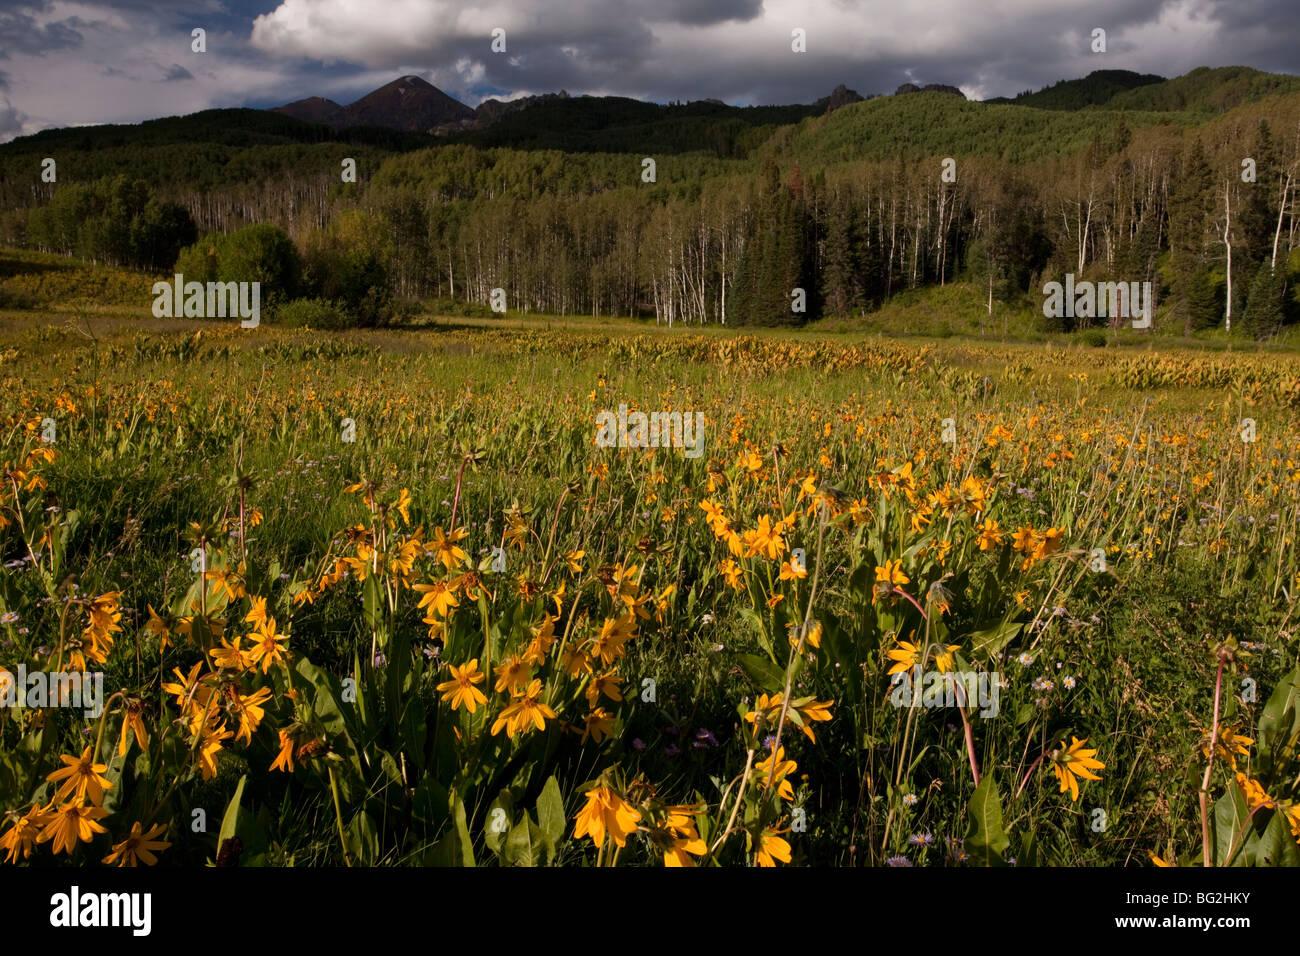 Mountain Sneezeweed Stock Photos & Mountain Sneezeweed Stock Images ...